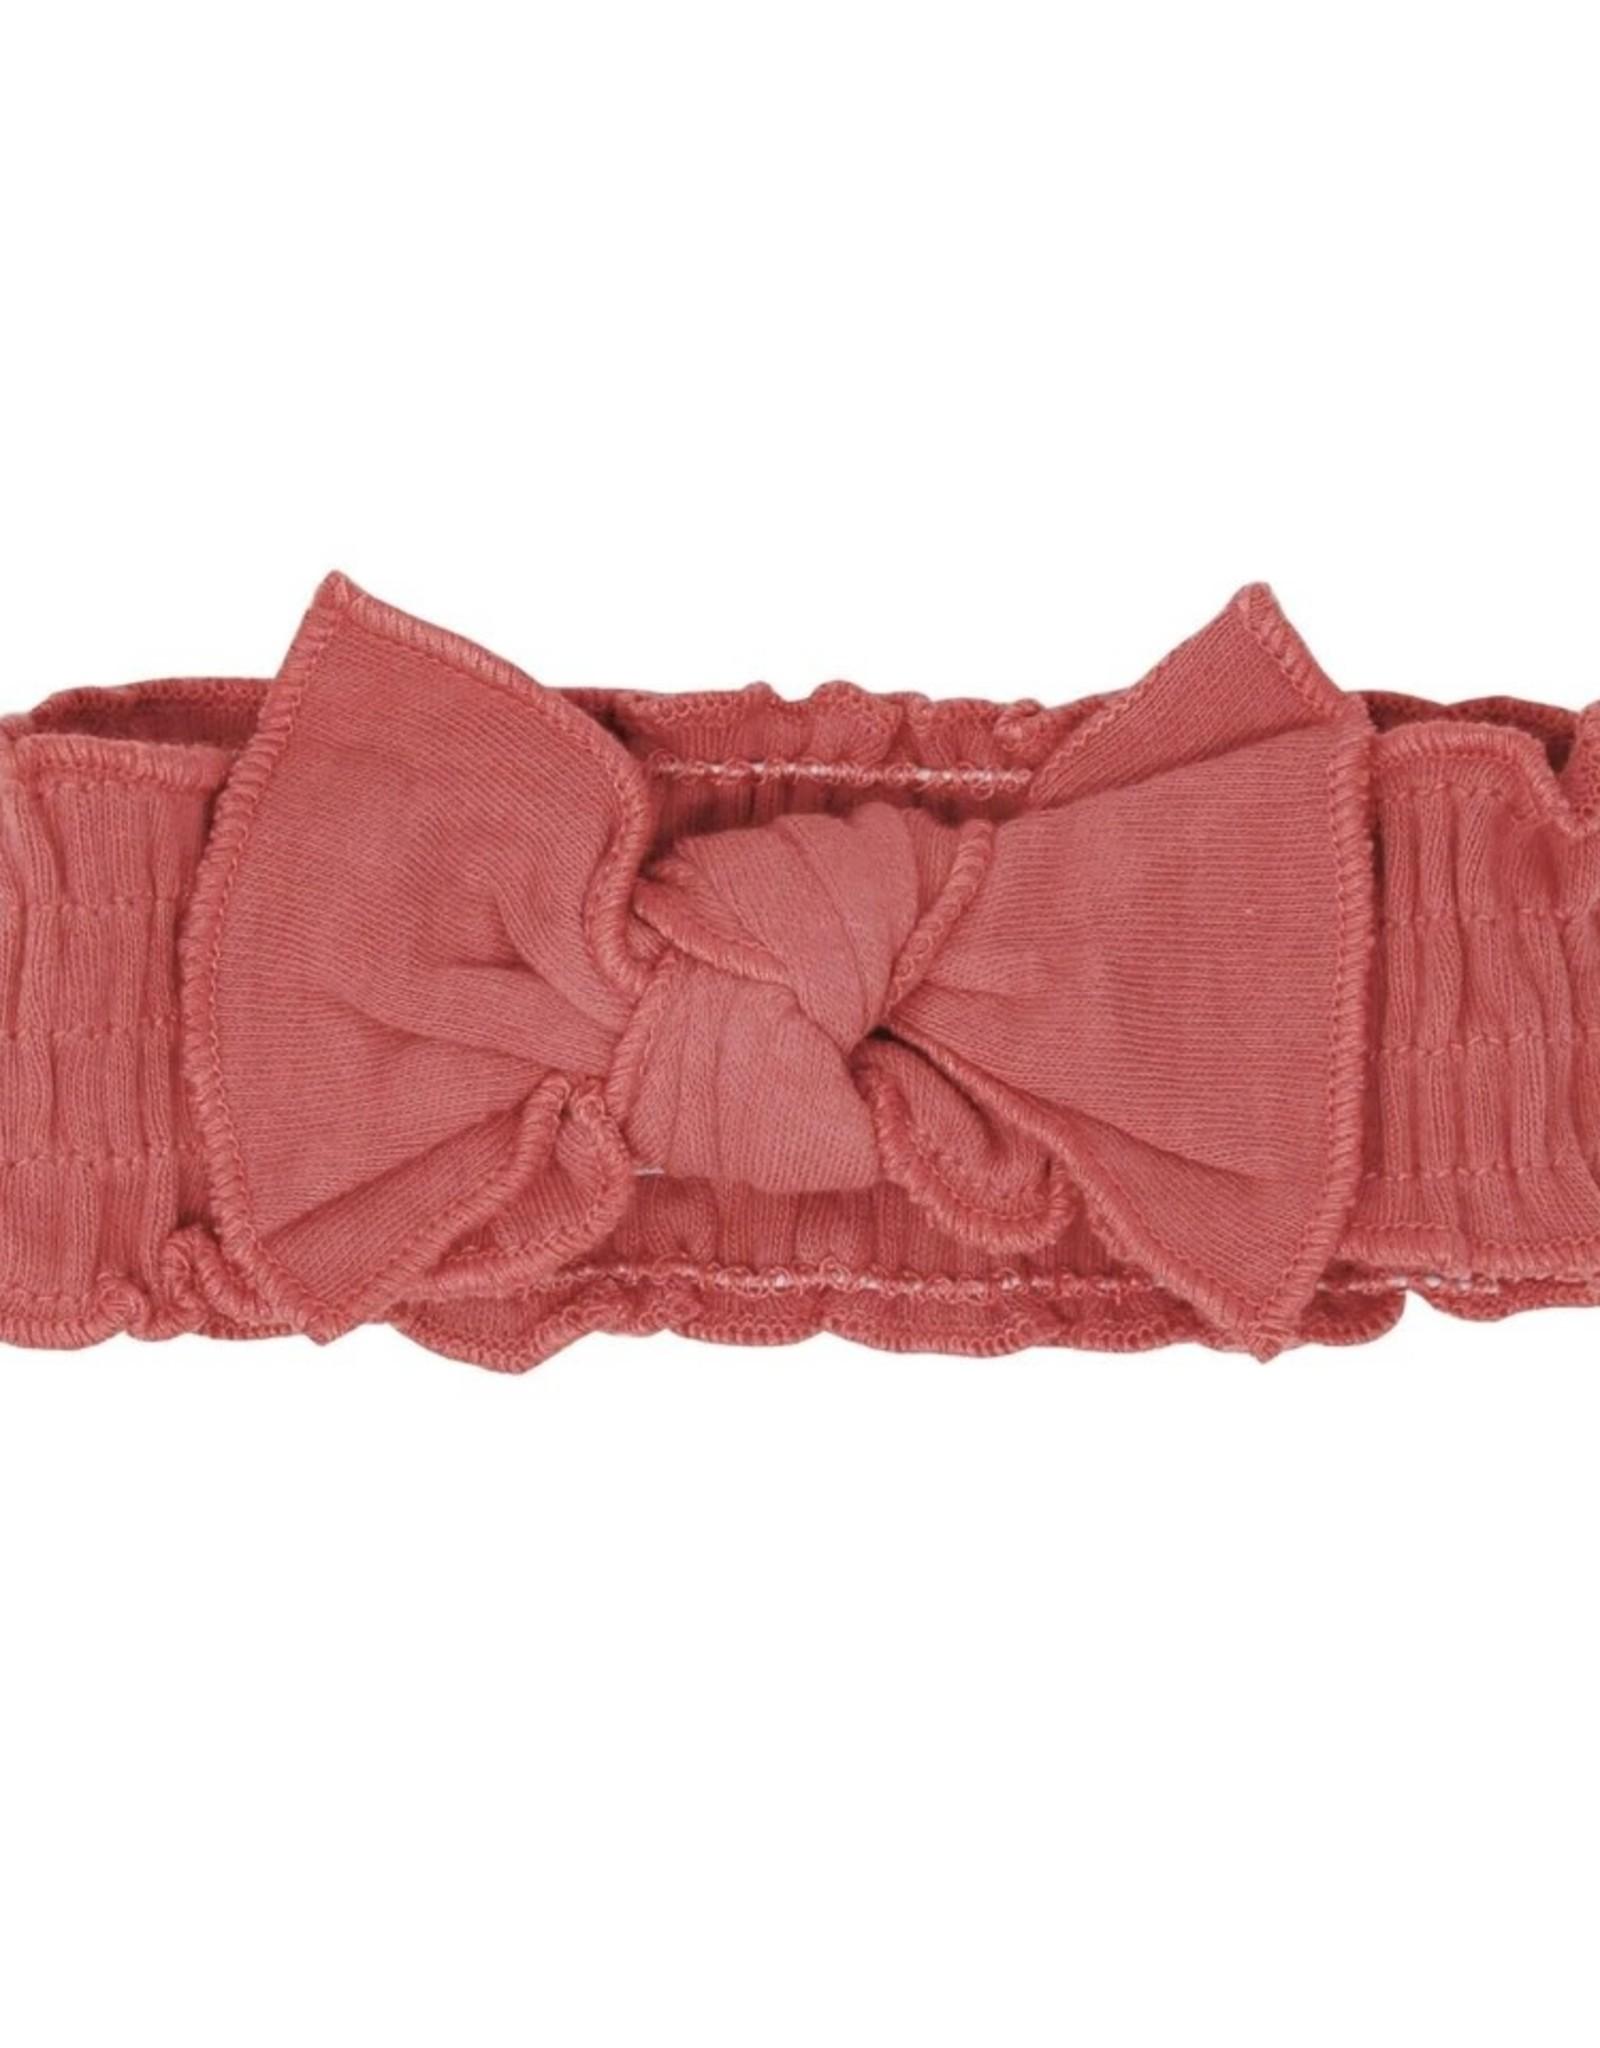 L'oved Baby Smocked Tie Headband Sienna